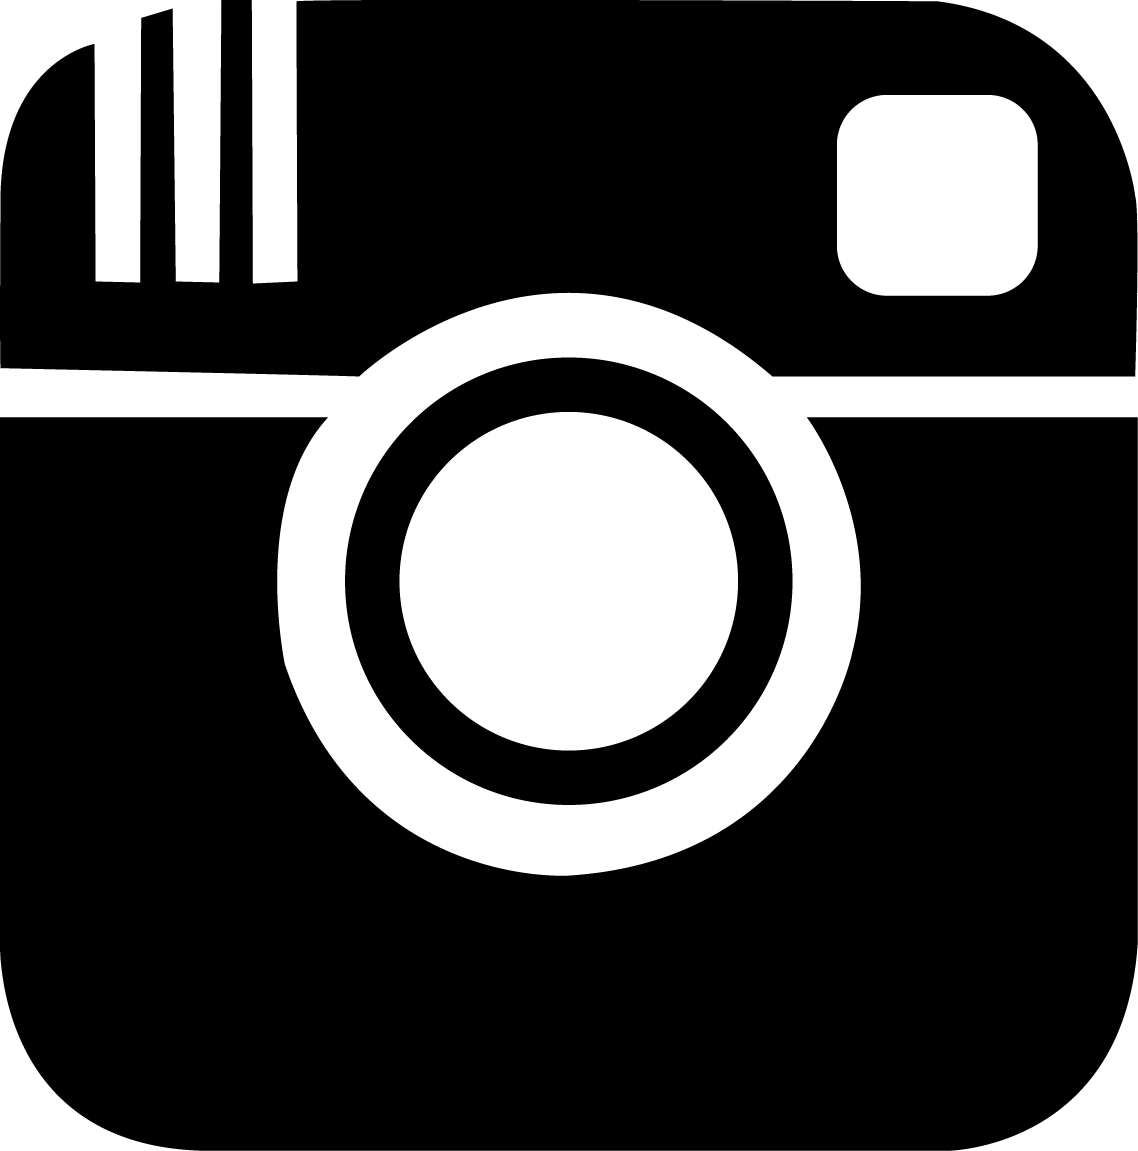 14 Instagram Logo Vector Ai Images - Instagram Logo Vector ...